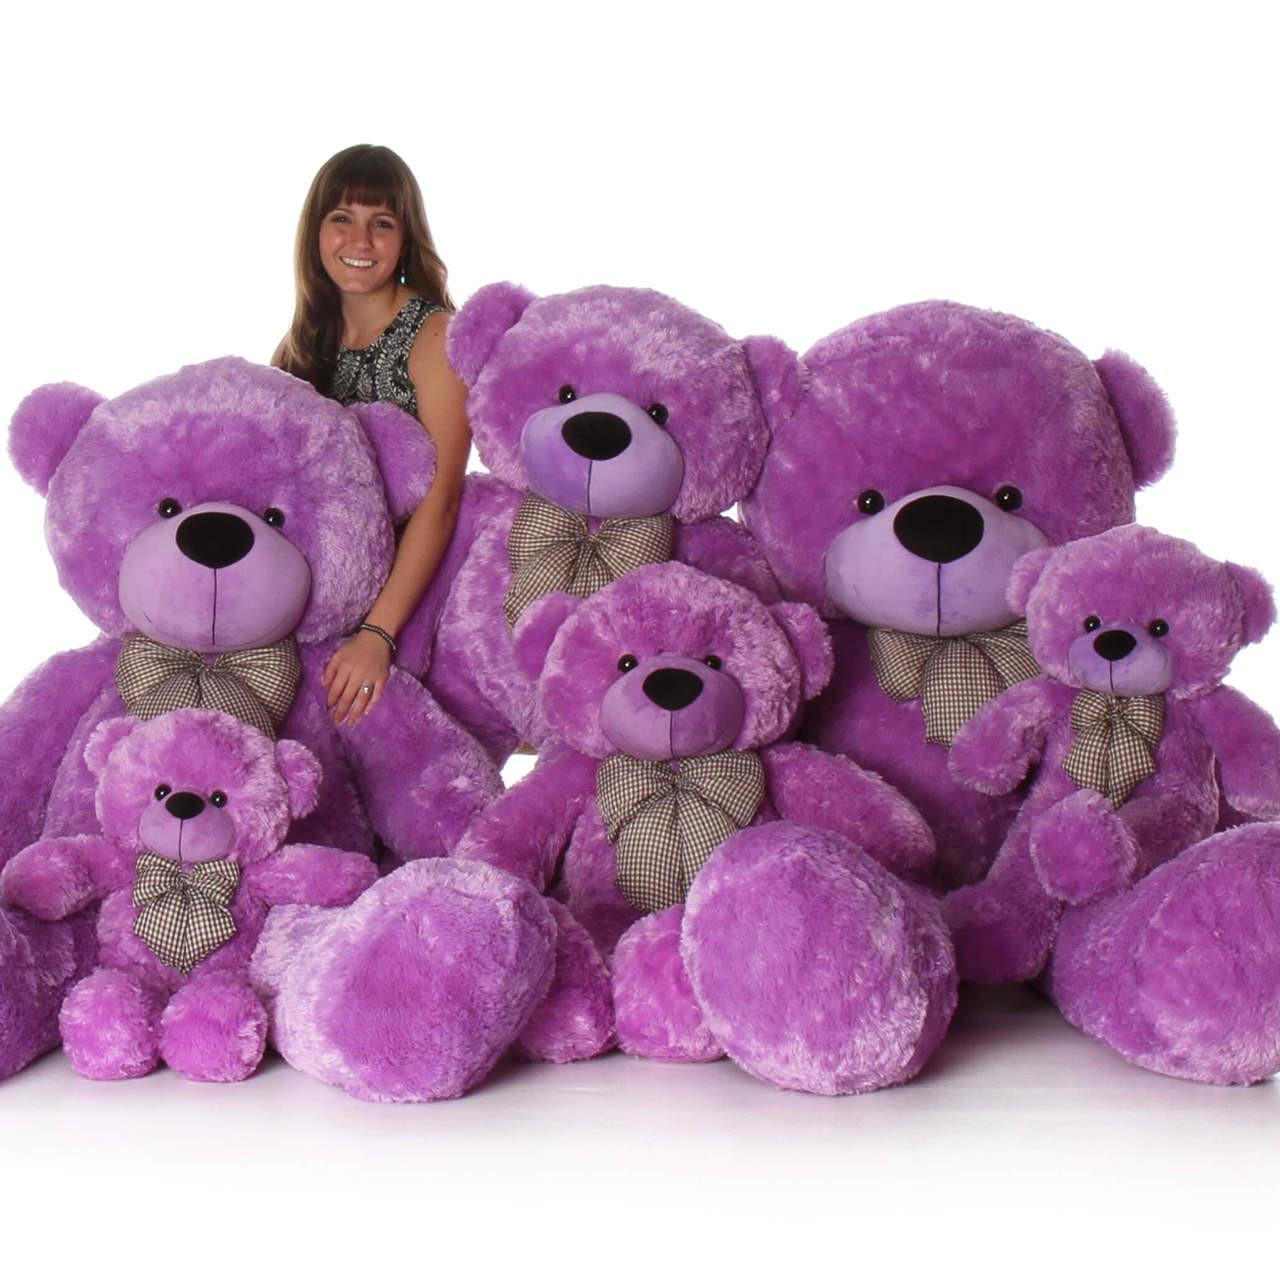 DeeDee Cuddles Family